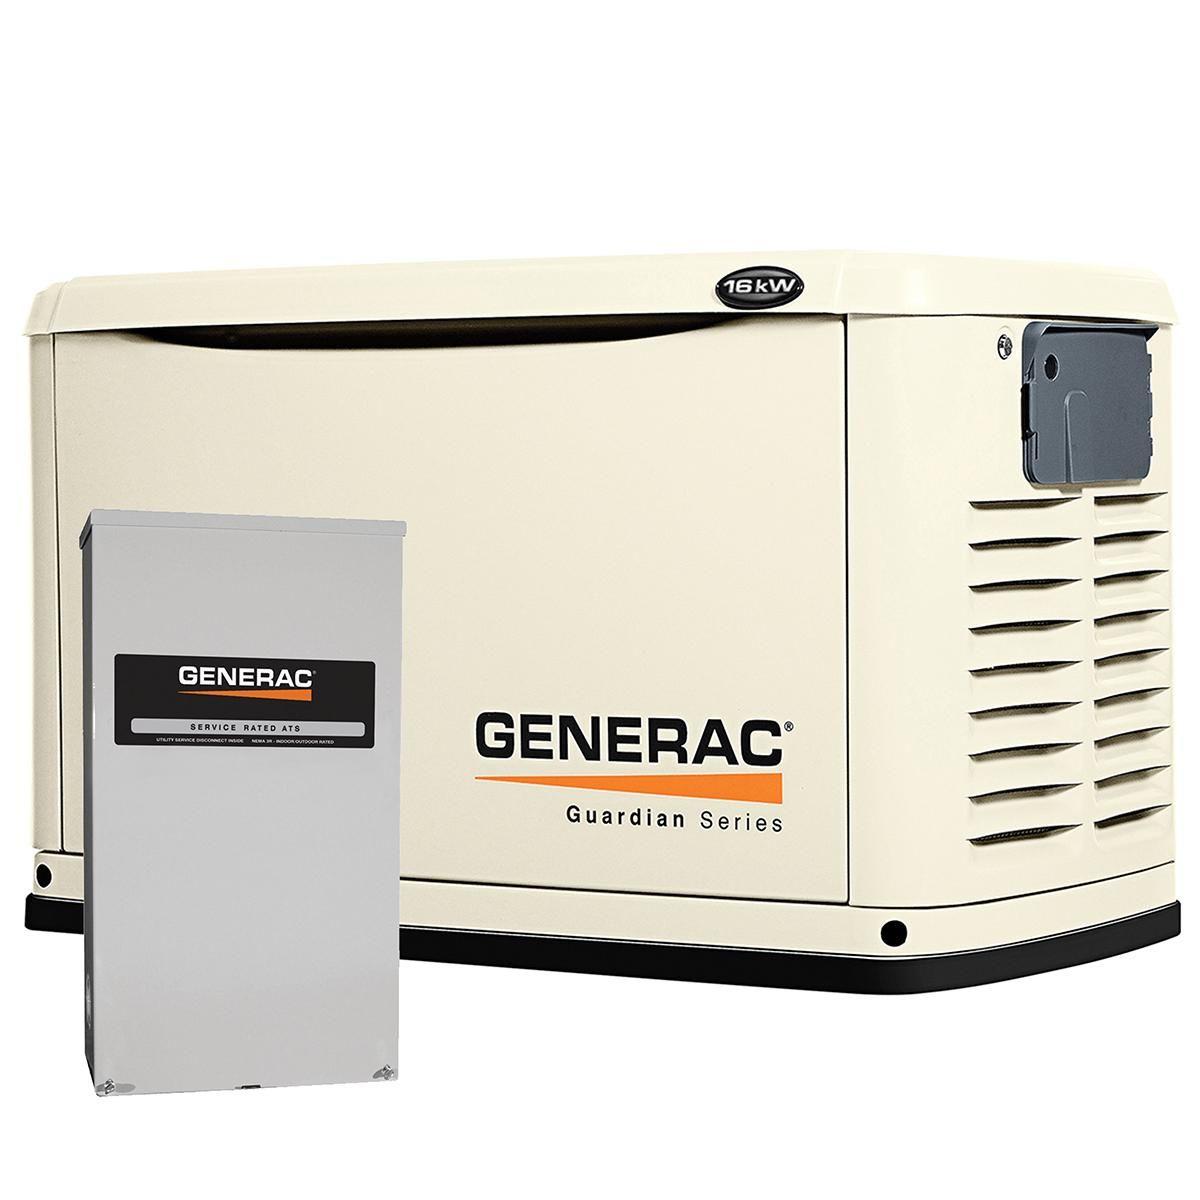 Robot Check Transfer Switch Standby Generators Propane Generator